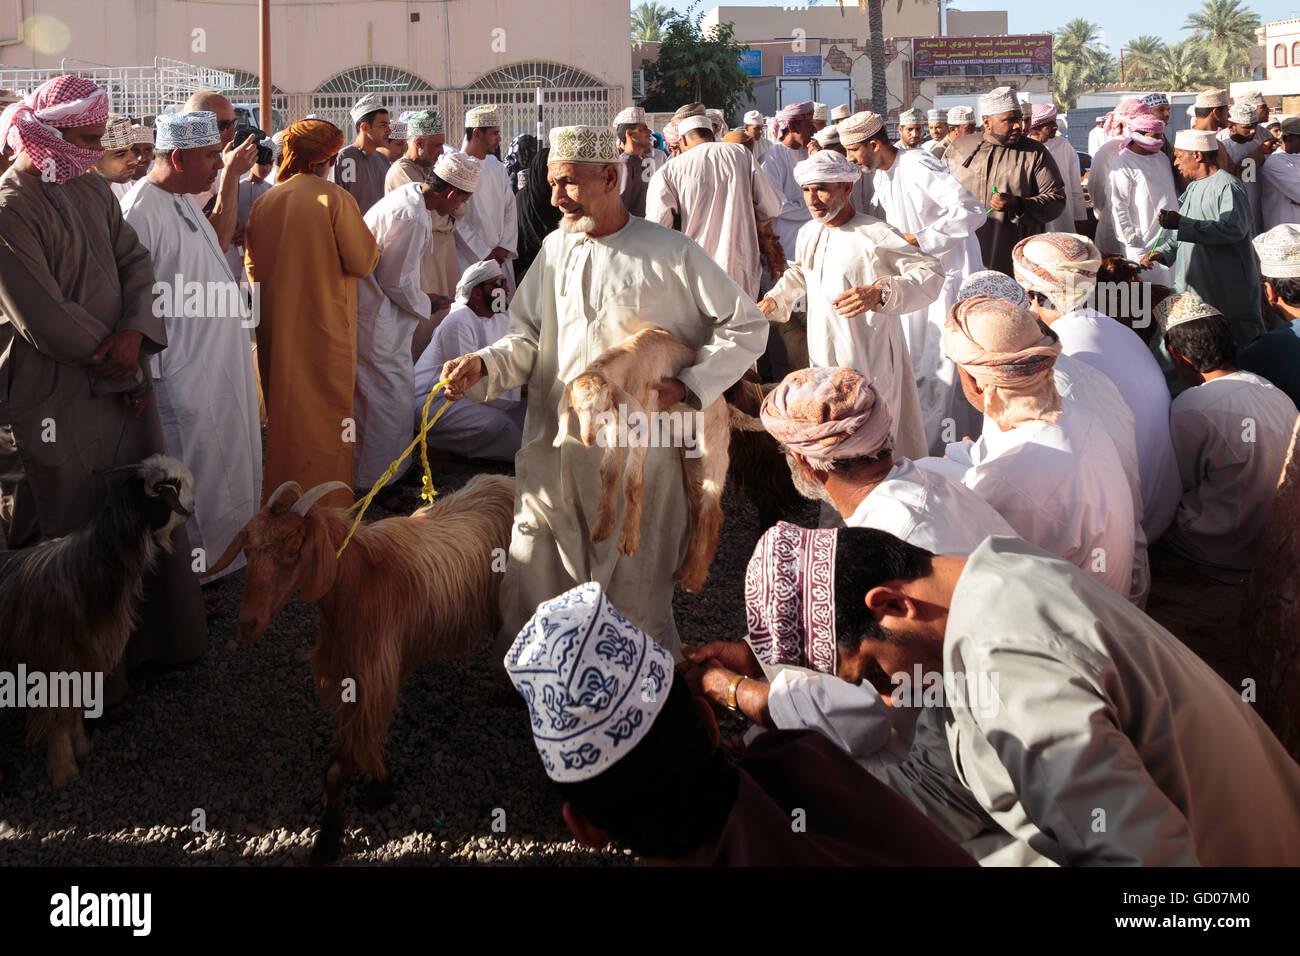 NIZWA, OMAN - APRIL 24 2015:Omani men at the traditional cattle market or souq in Nizwa, Oman. - Stock Image